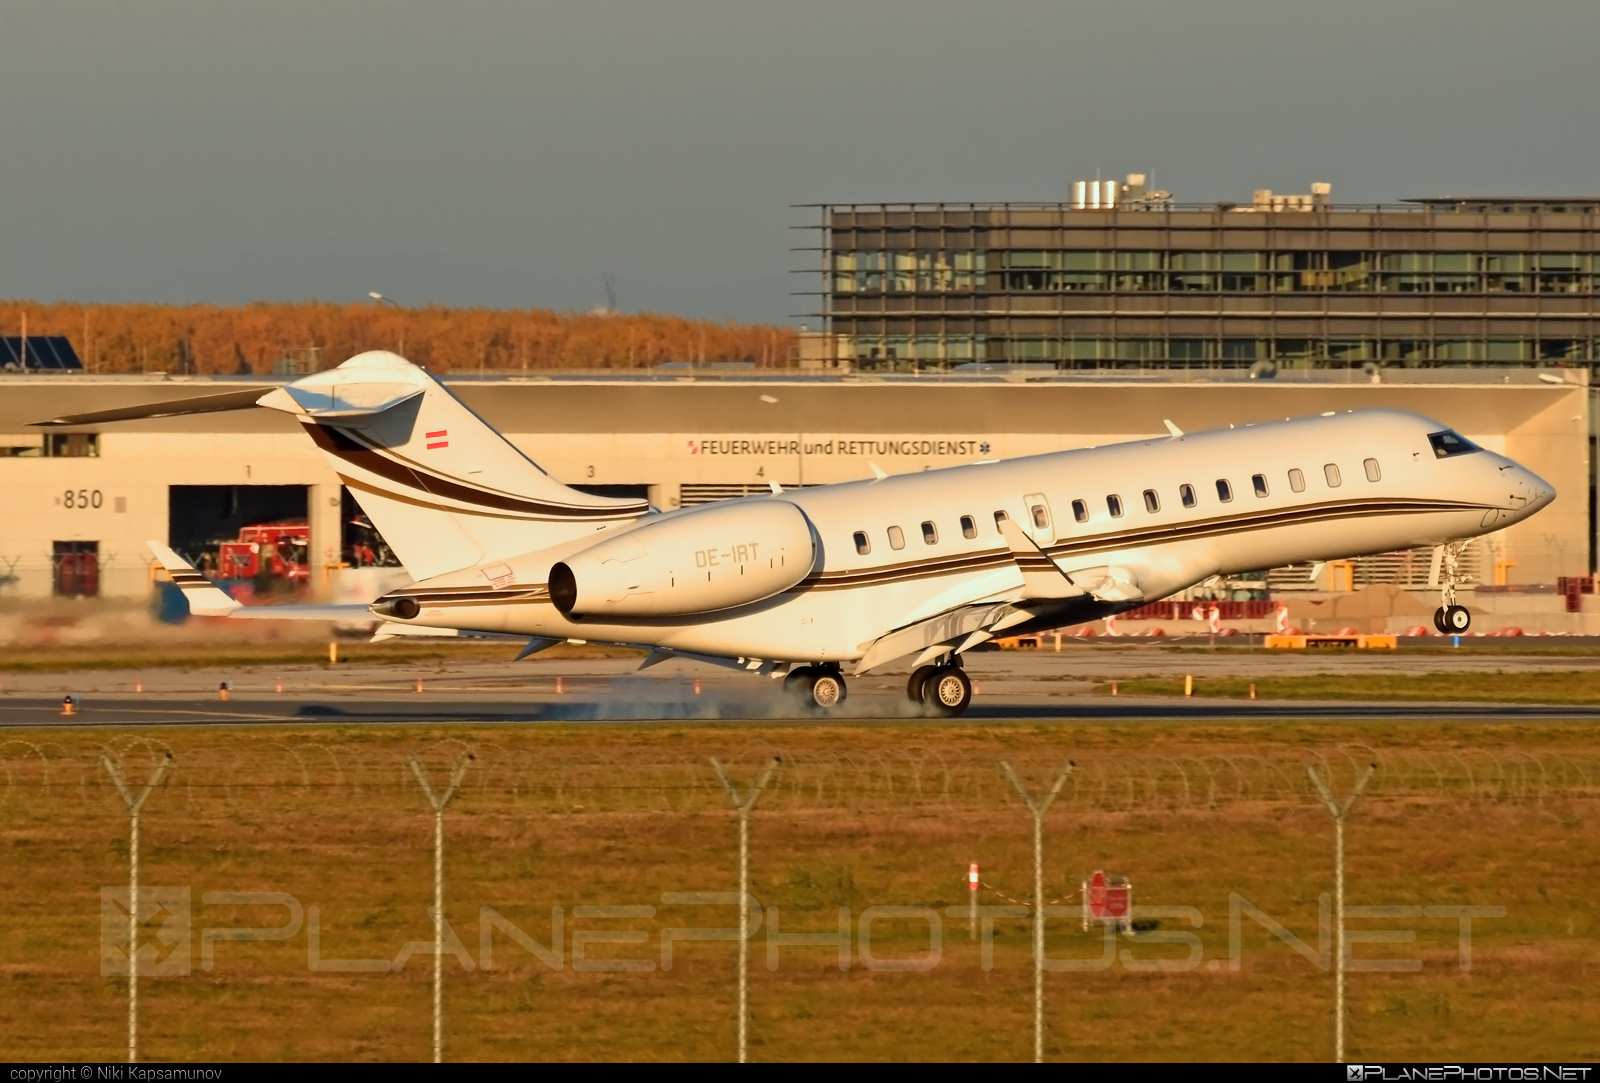 Bombardier BD-700-1A10 Global 6000 - OE-IRT operated by ART Aviation Flugbetriebs GmbH #artaviation #artaviationflugbetriebs #bd7001a10 #bombardier #bombardierglobal6000 #global6000